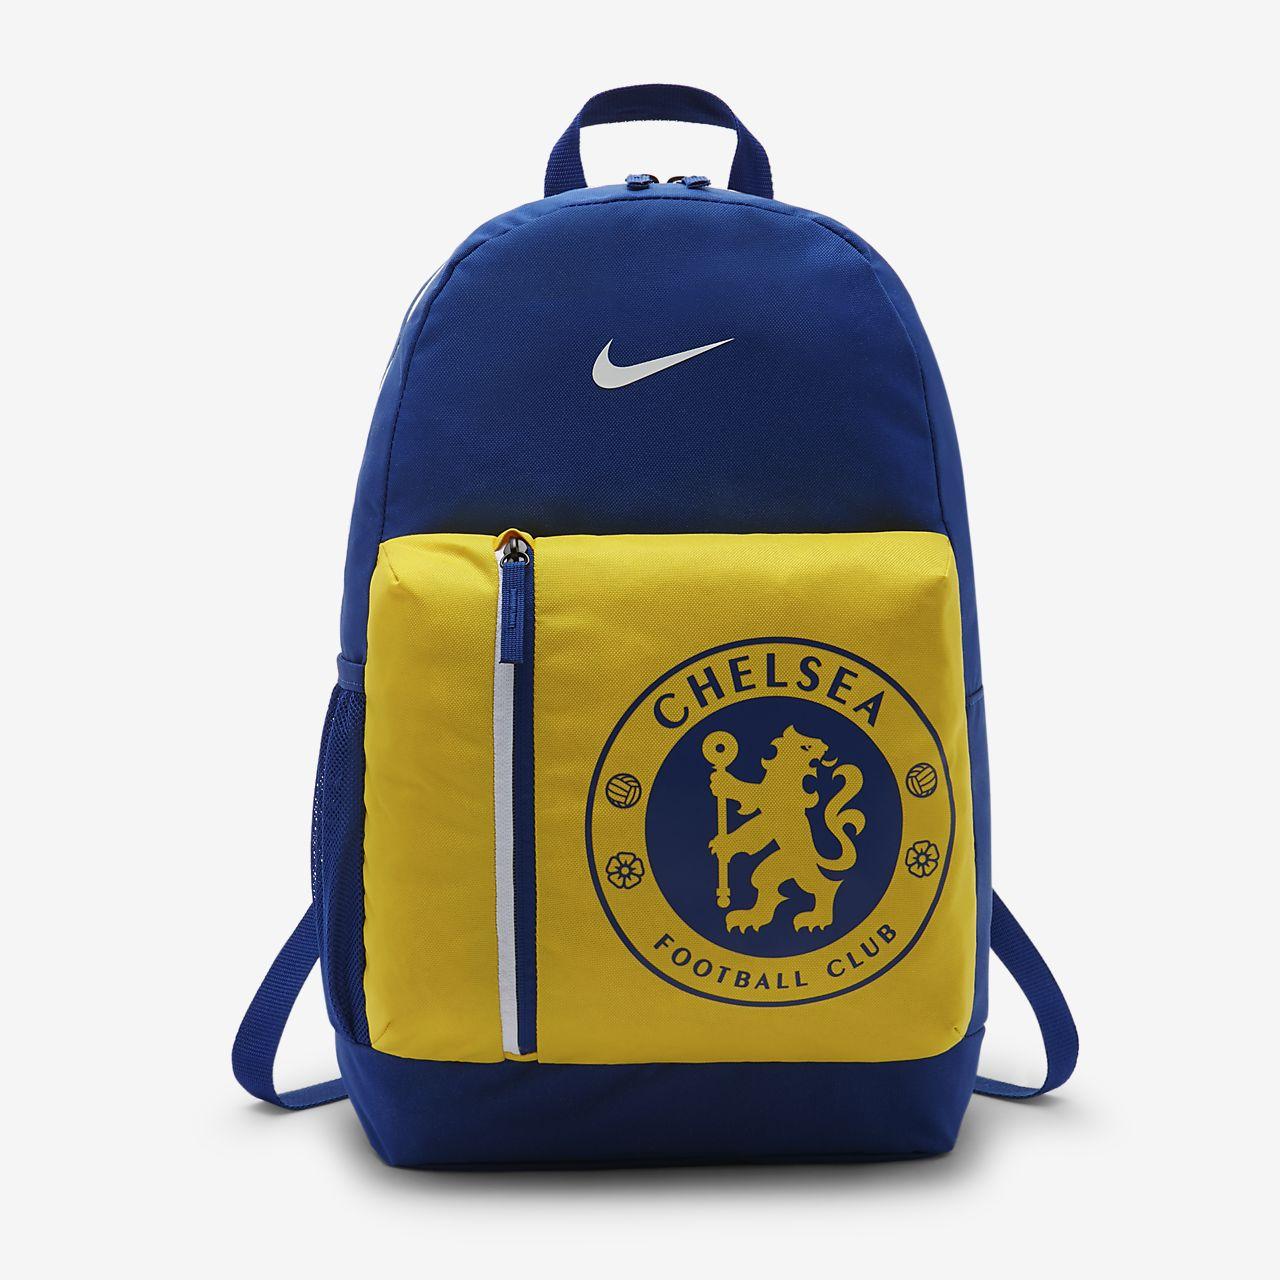 7b99222dc1 Zaino da calcio Chelsea FC Stadium - Ragazzi. Nike.com CH